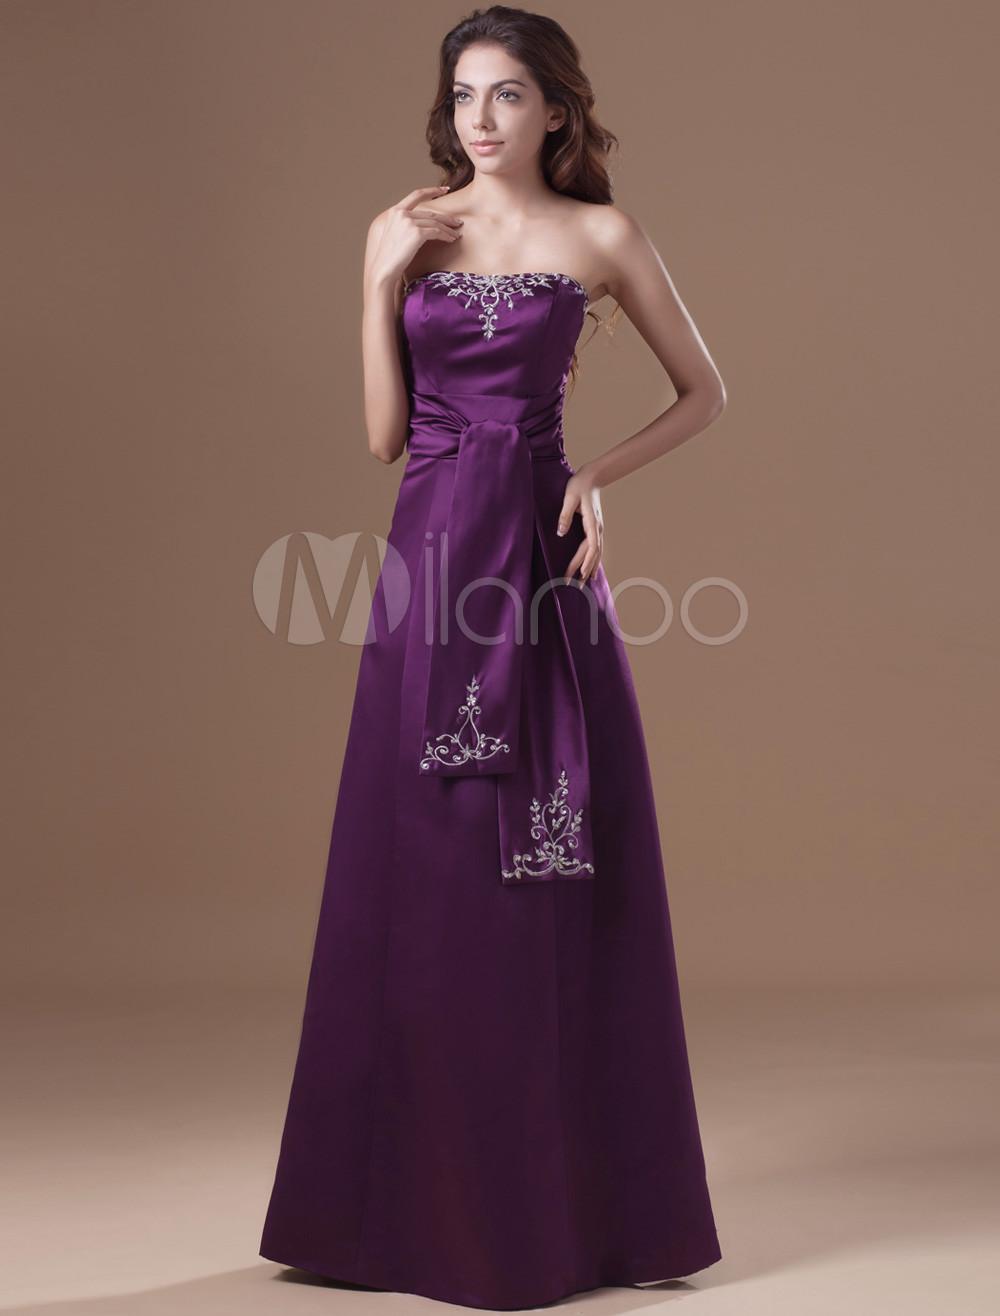 Grace Lilac Satin Lace up Strapless Women's Evening Dress (Wedding Cheap Party Dress) photo